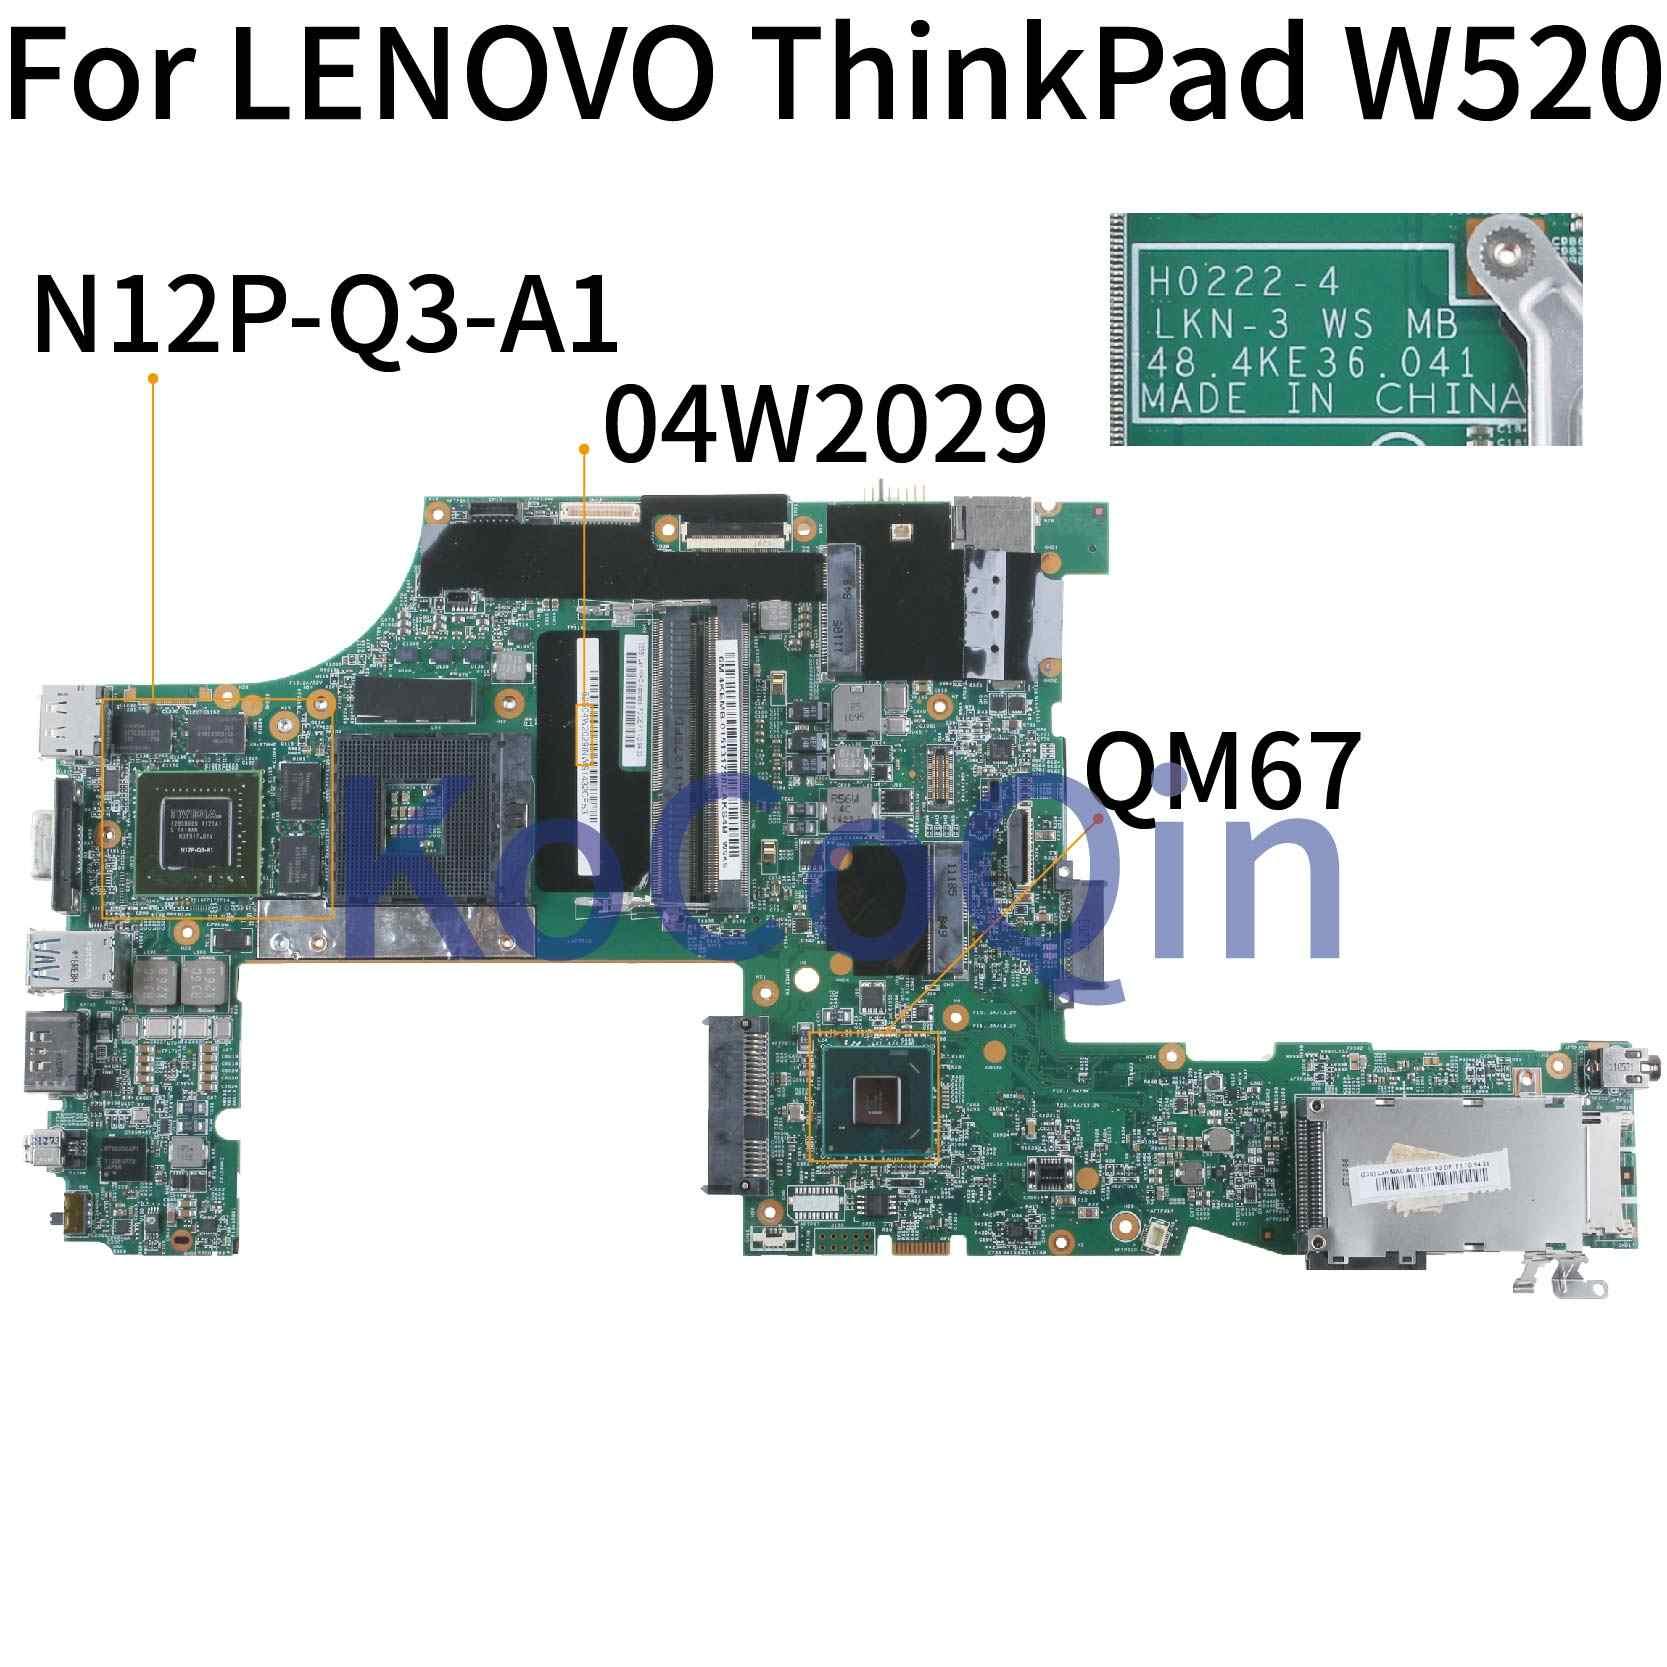 KoCoQin Scheda Madre del computer portatile Per LENOVO ThinkPad W520 Q2000M Mainboard 04W2029 H0222-4 LKN-3 48.4KE36.041 QM67 N12P-Q3-A1